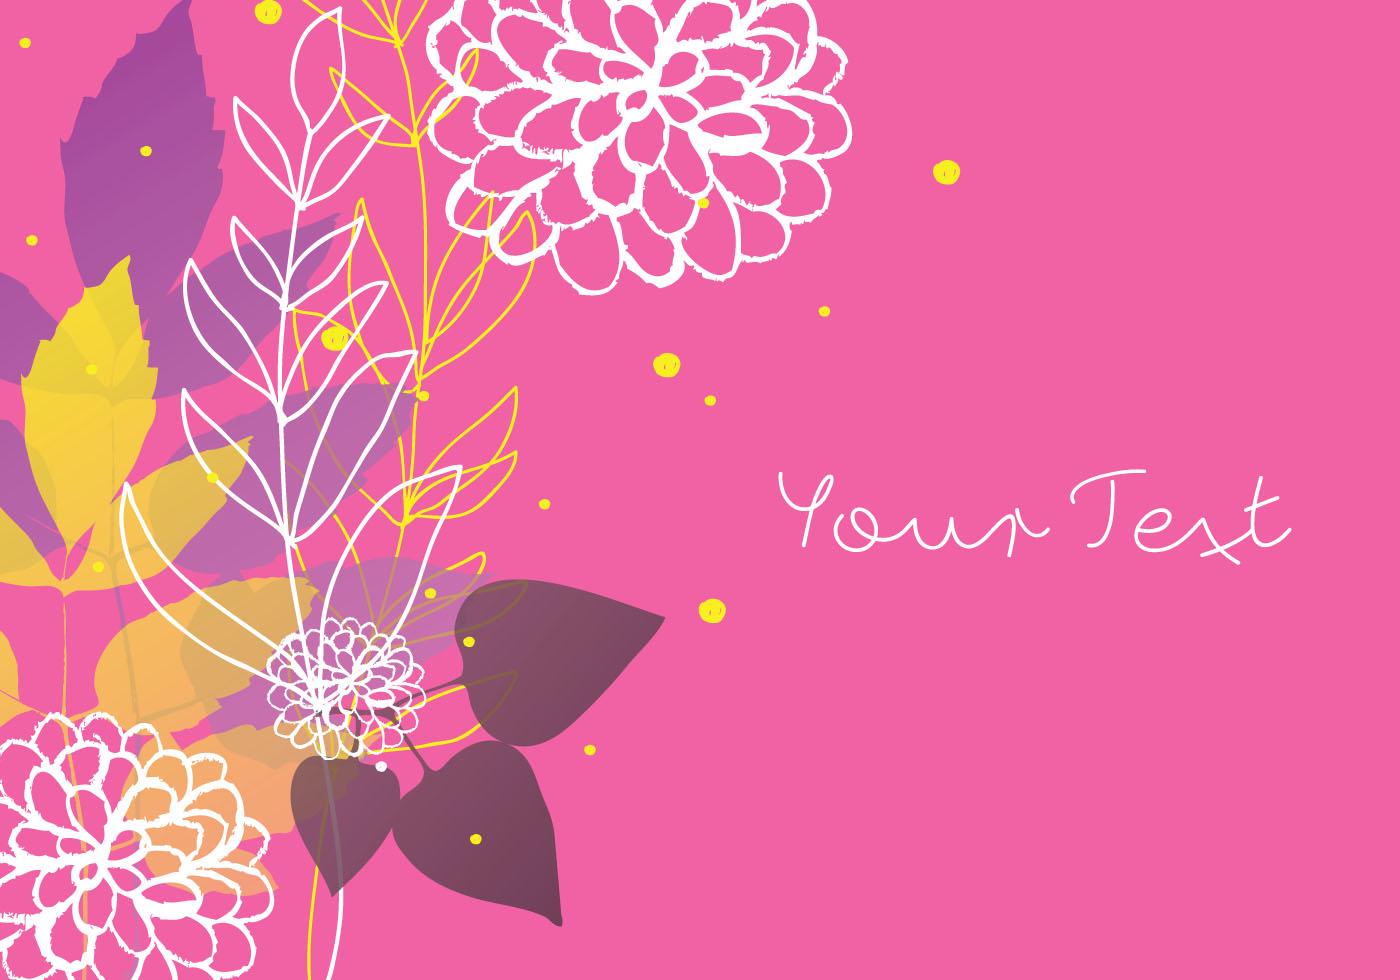 Decorative Floral Colorful Background Design - Download ...